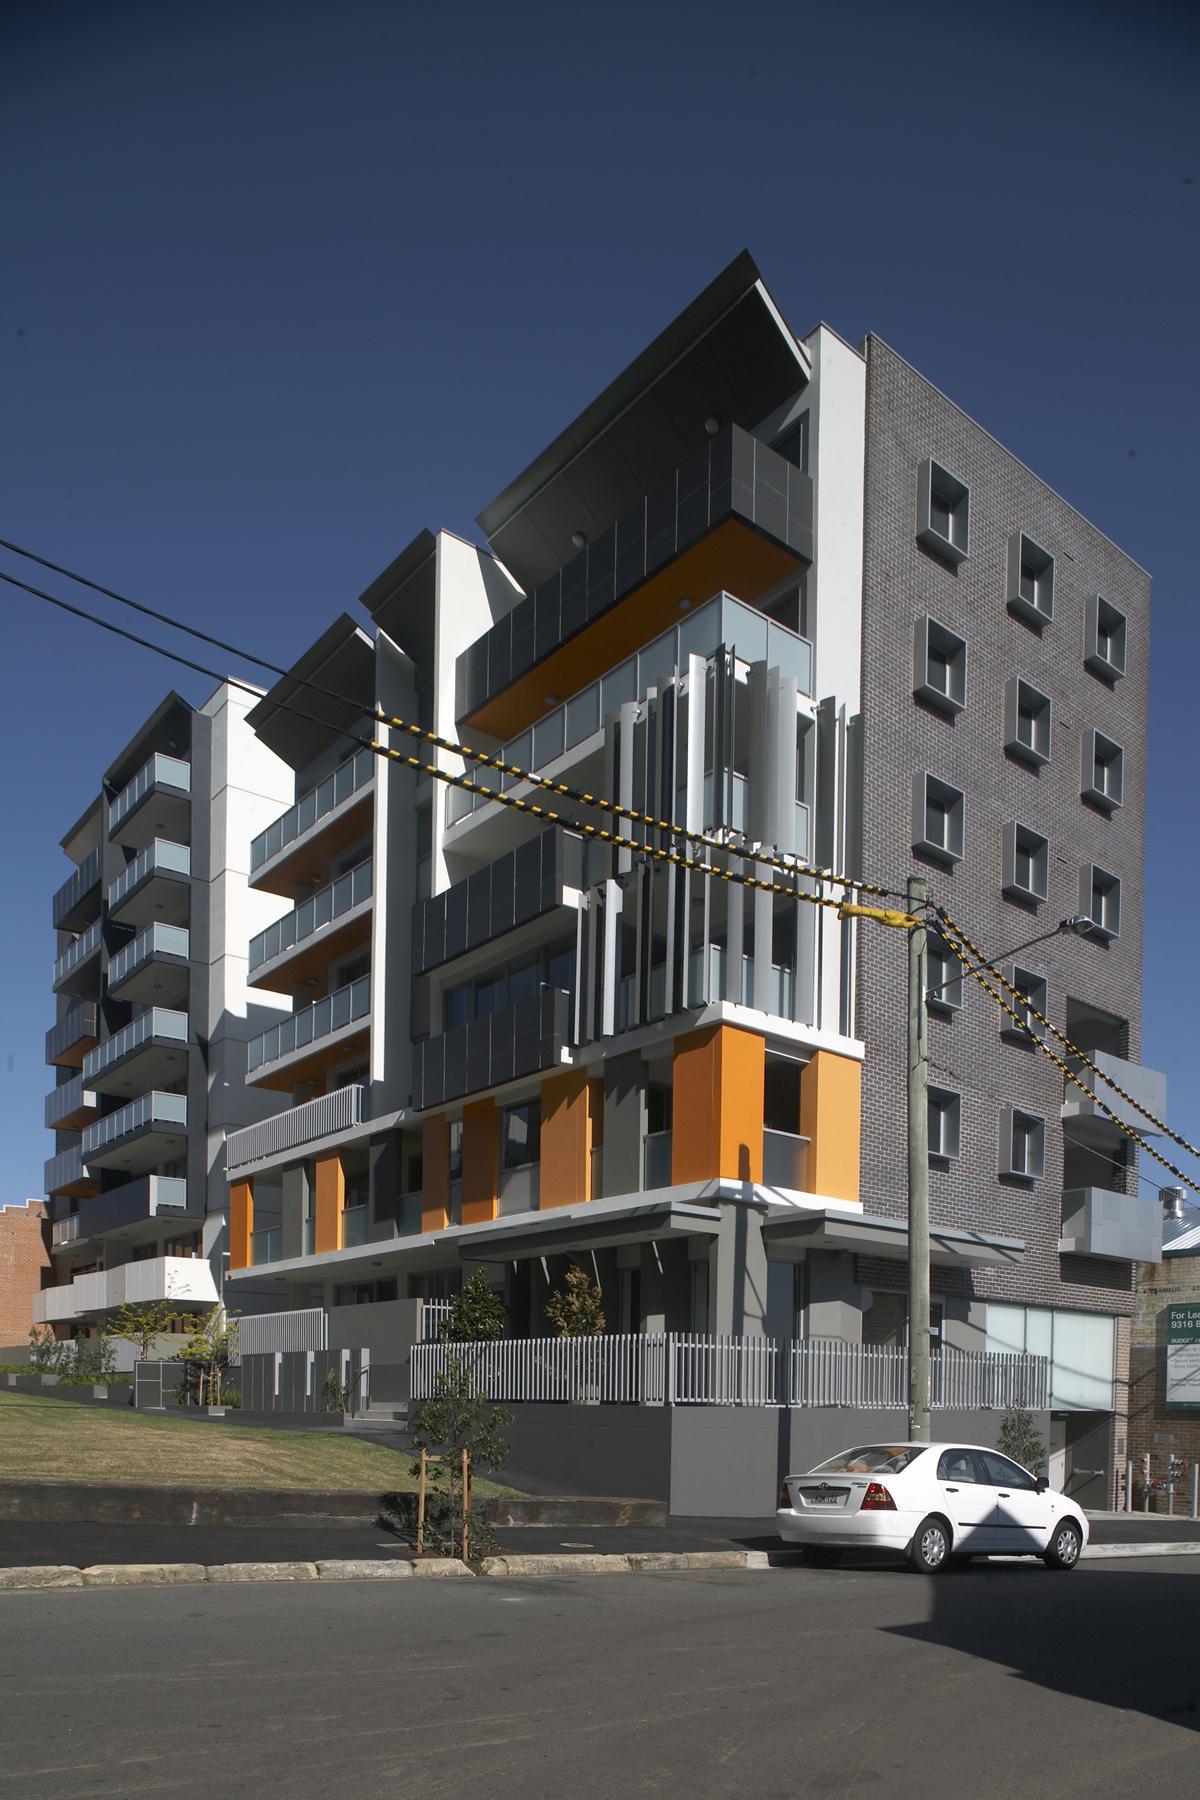 Russell Prescott Architects011007IMG_1009_24.jpg